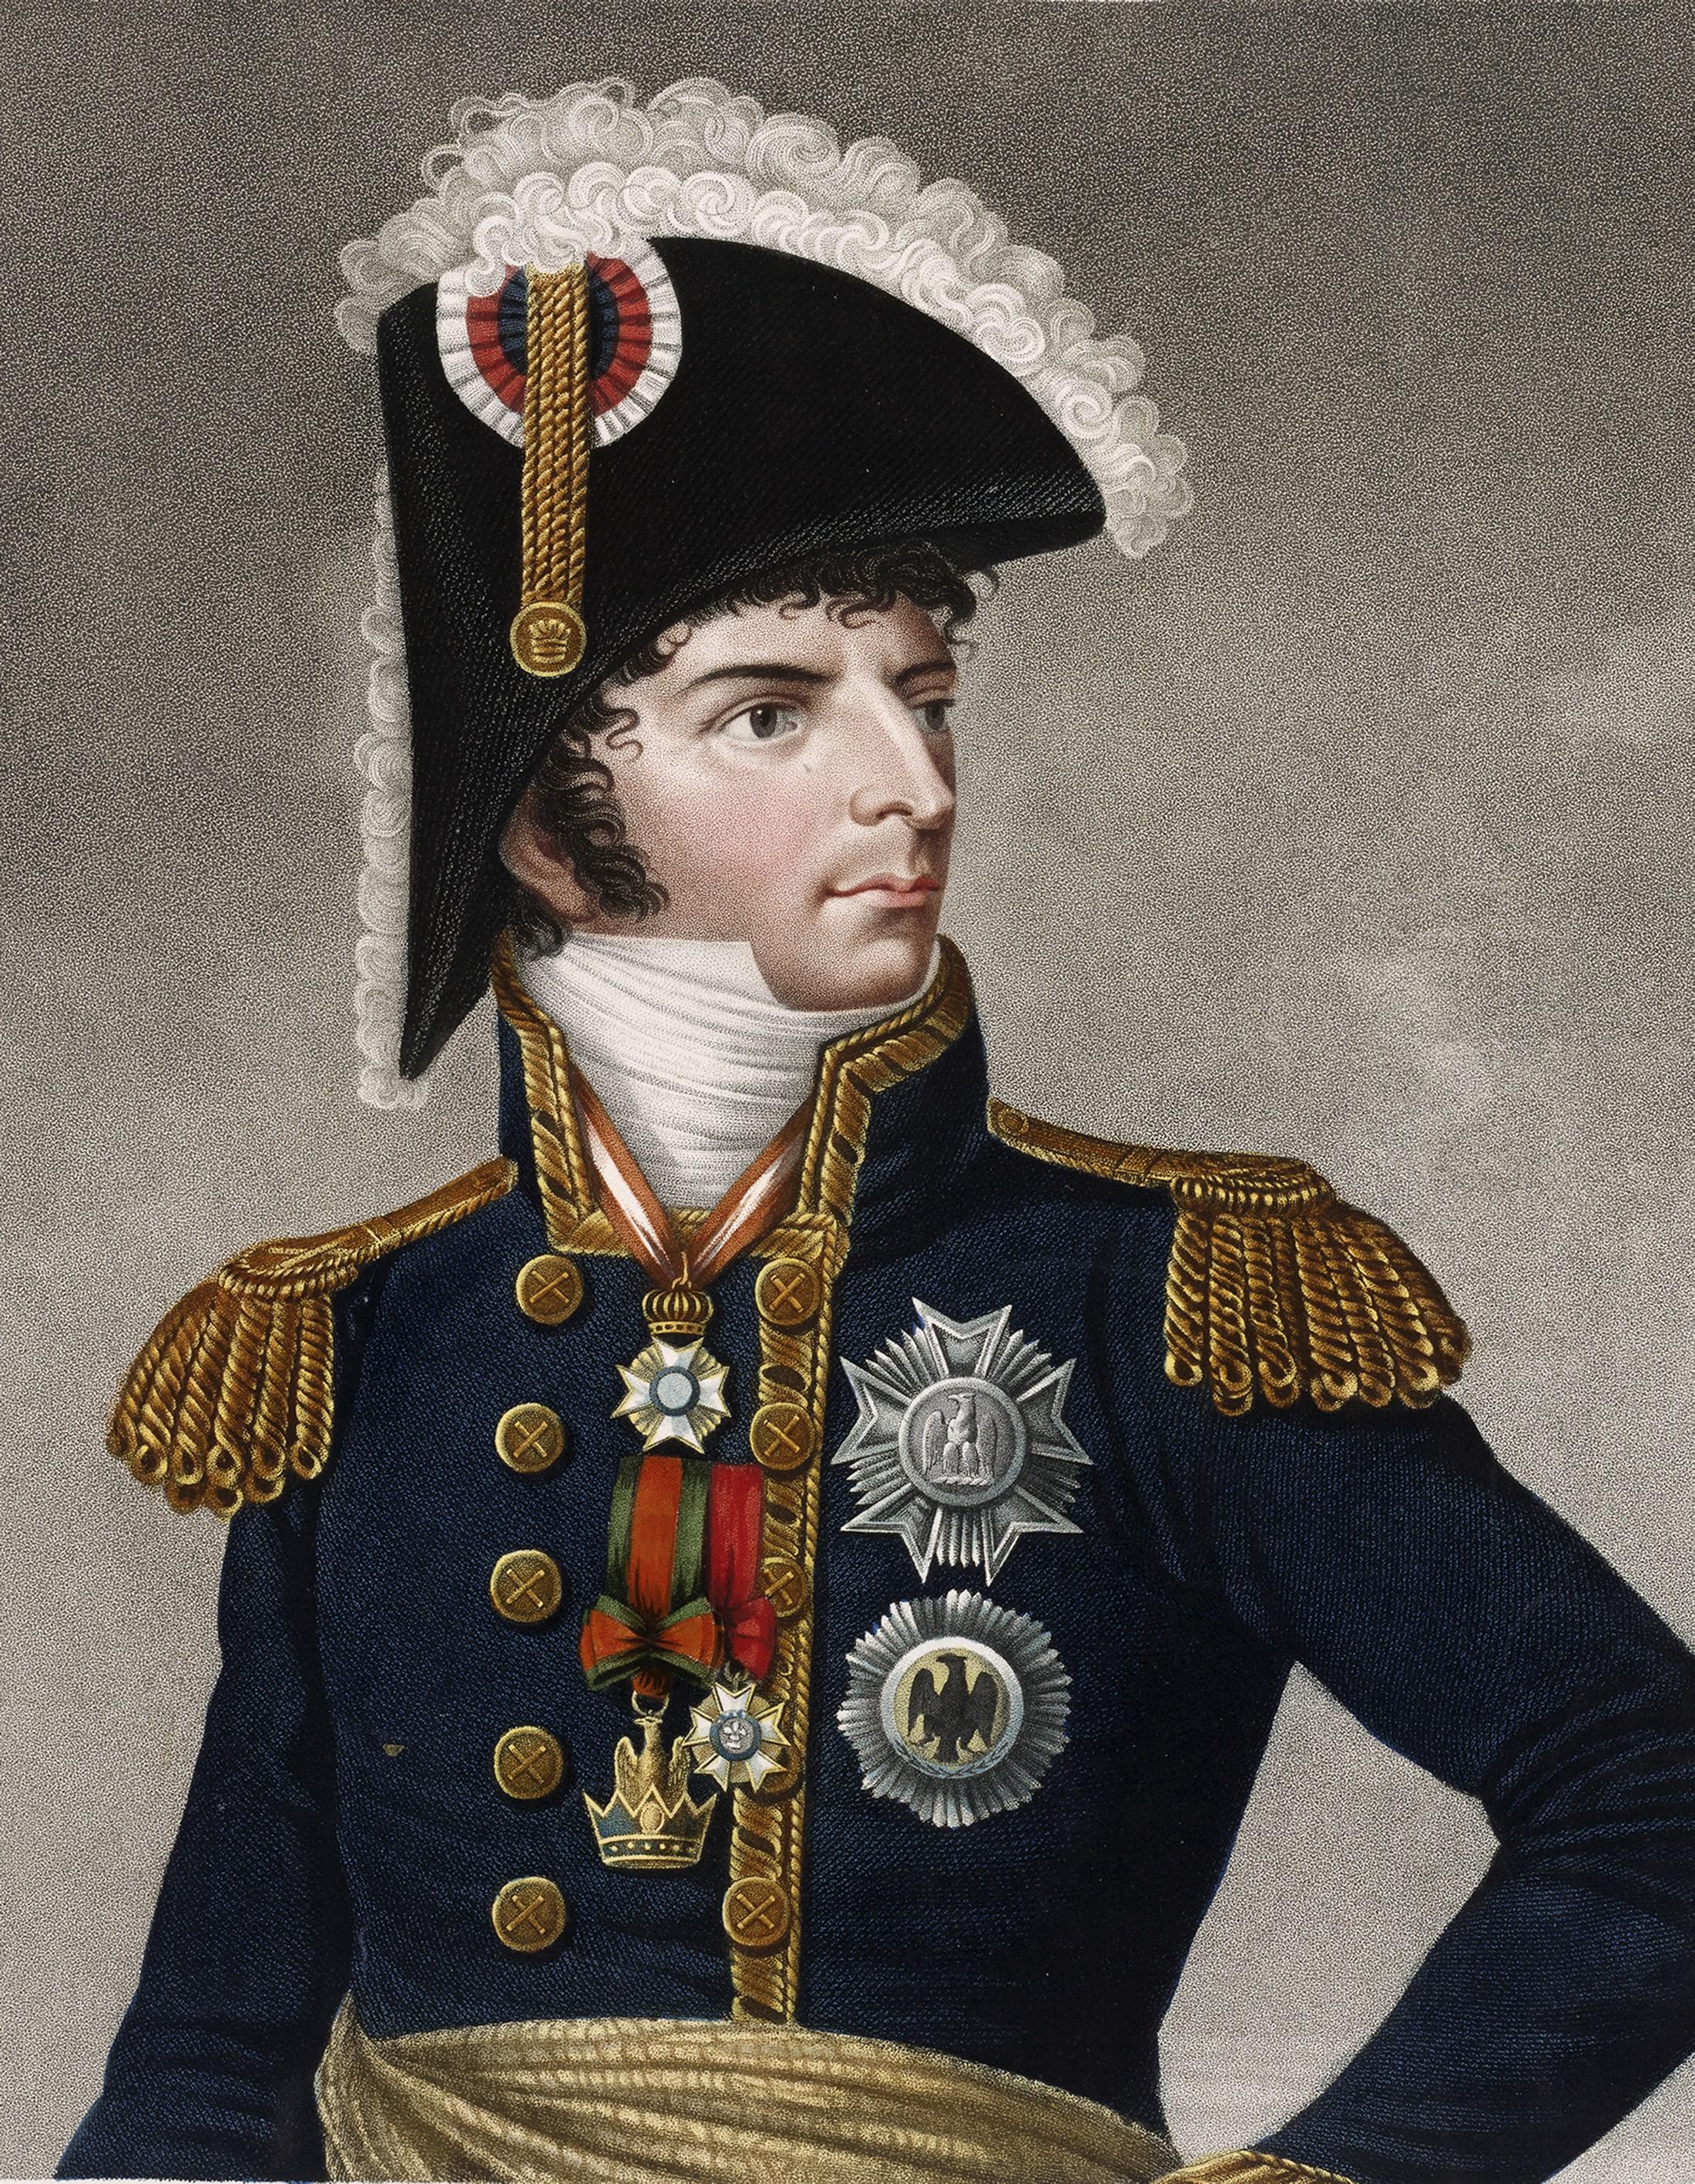 Jean-Baptiste Bernadotte